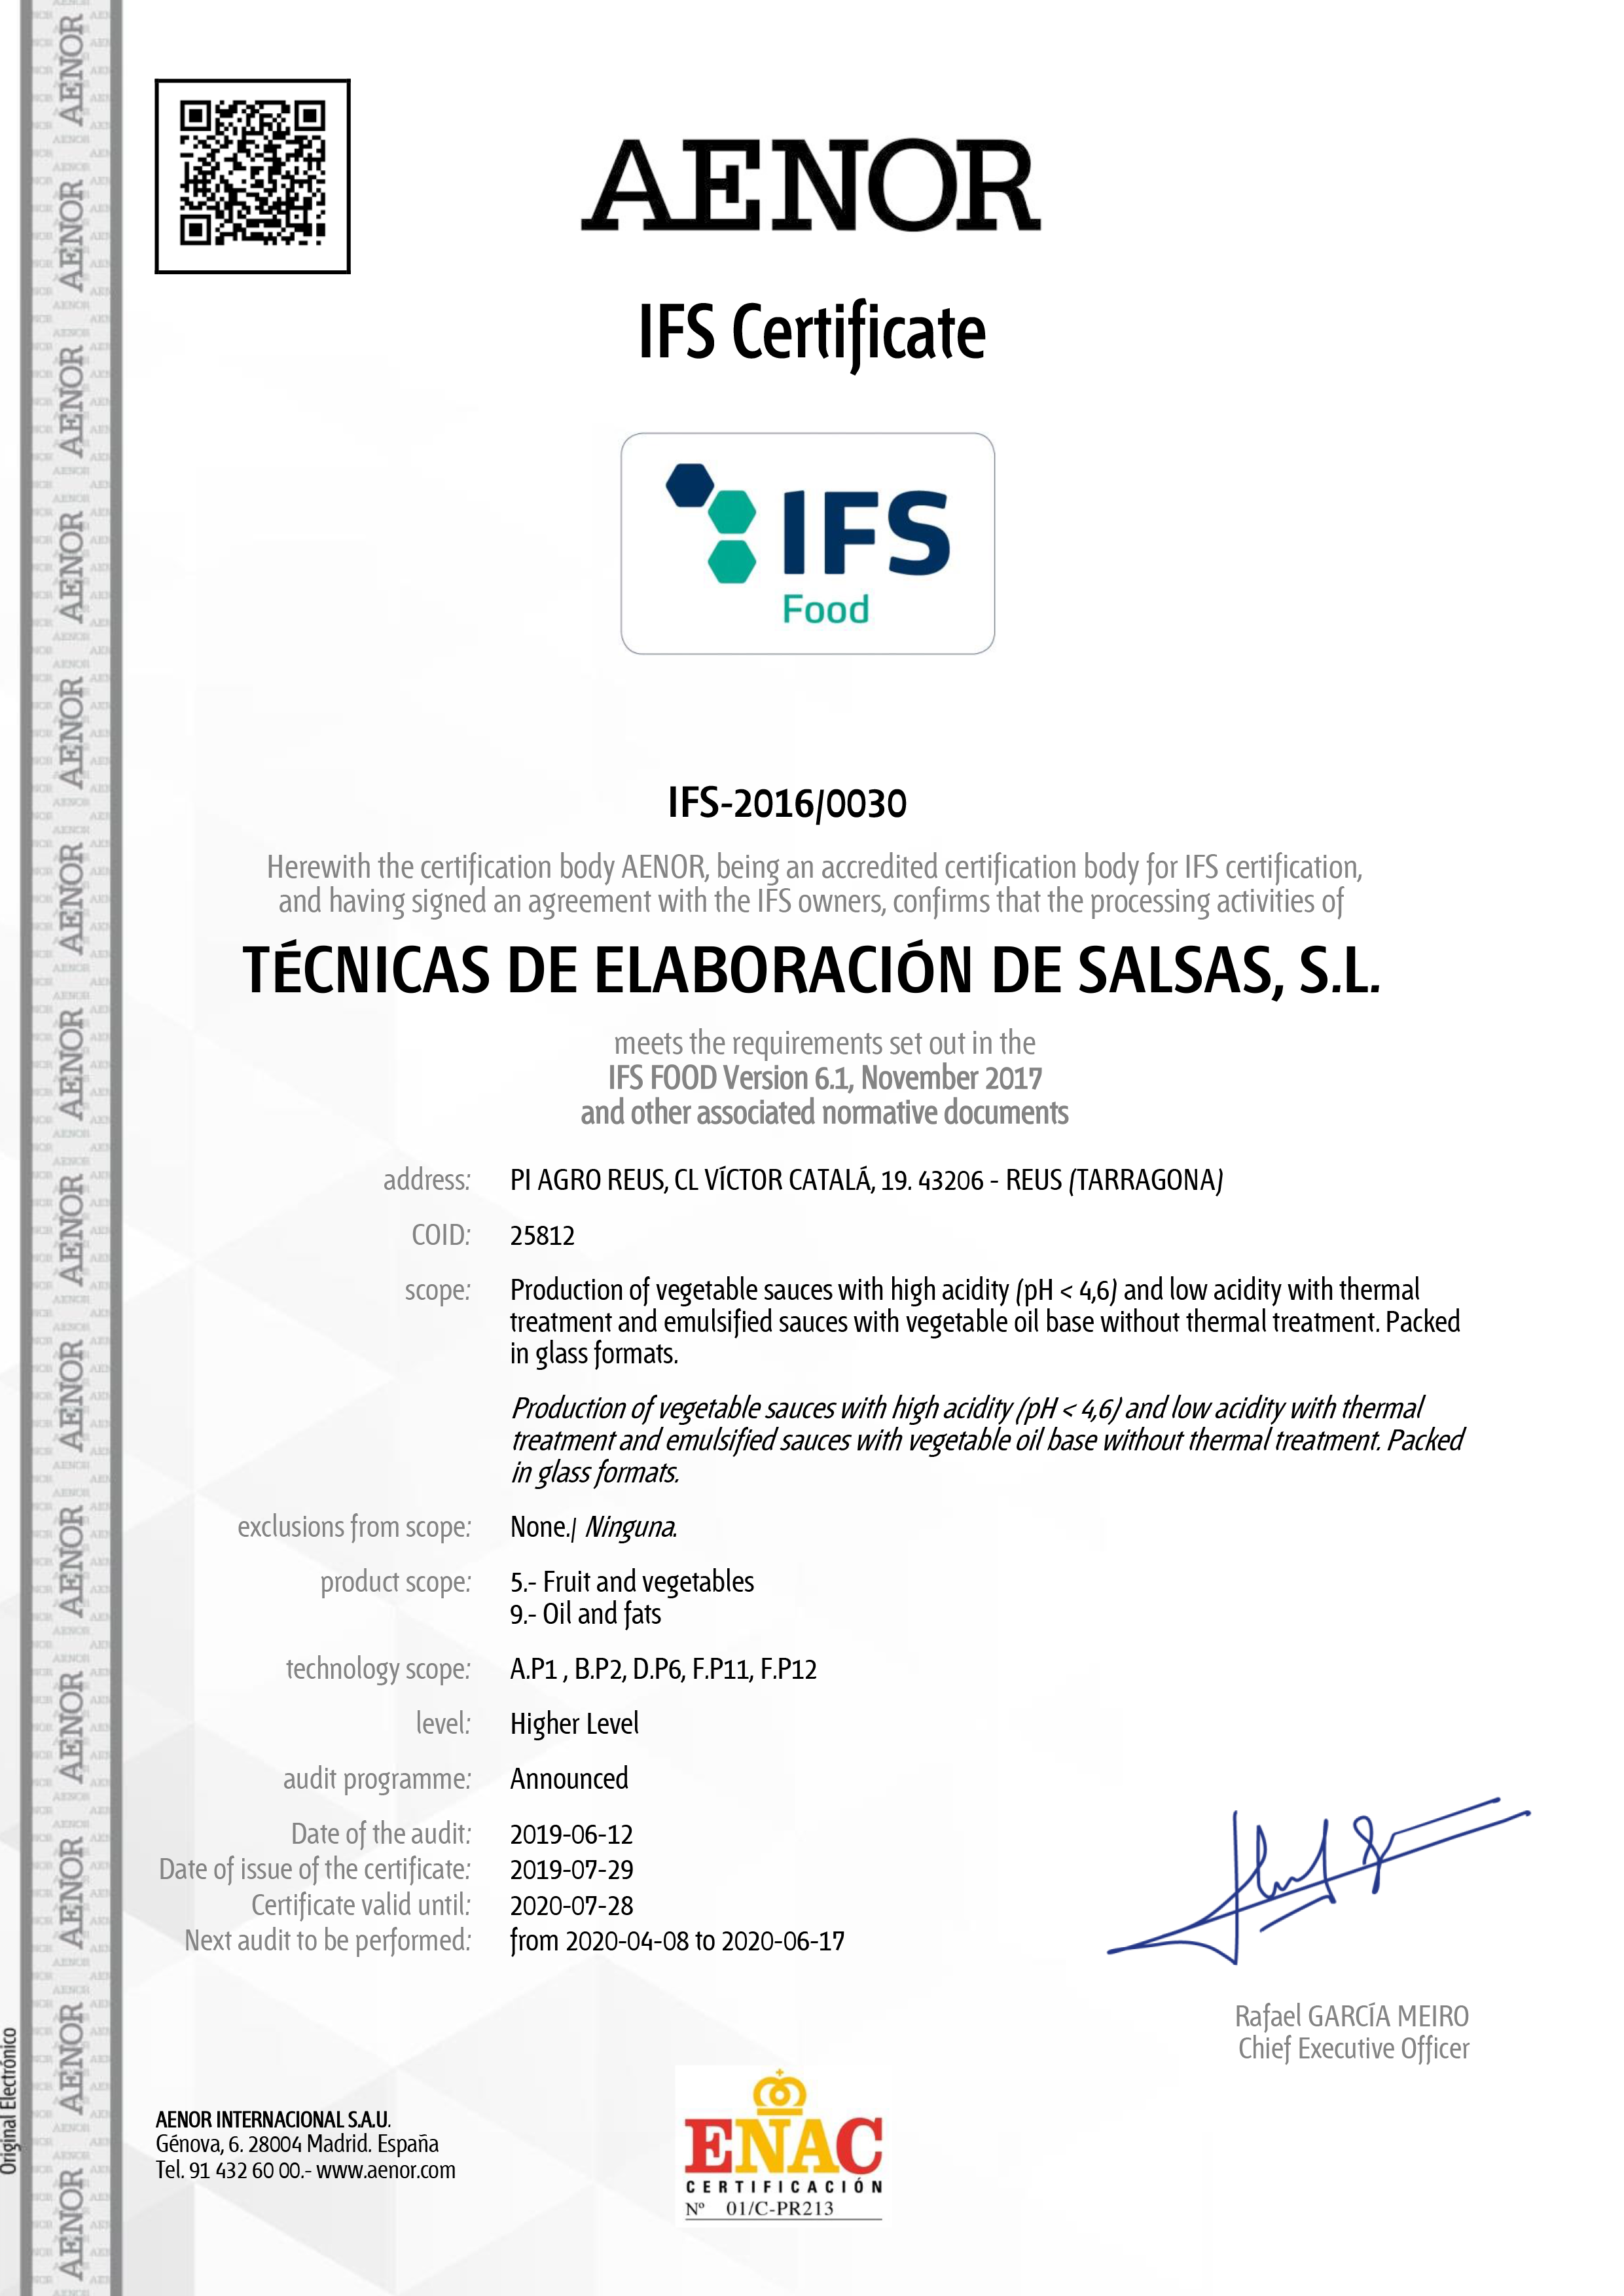 Certificado IFS - 2019-2020